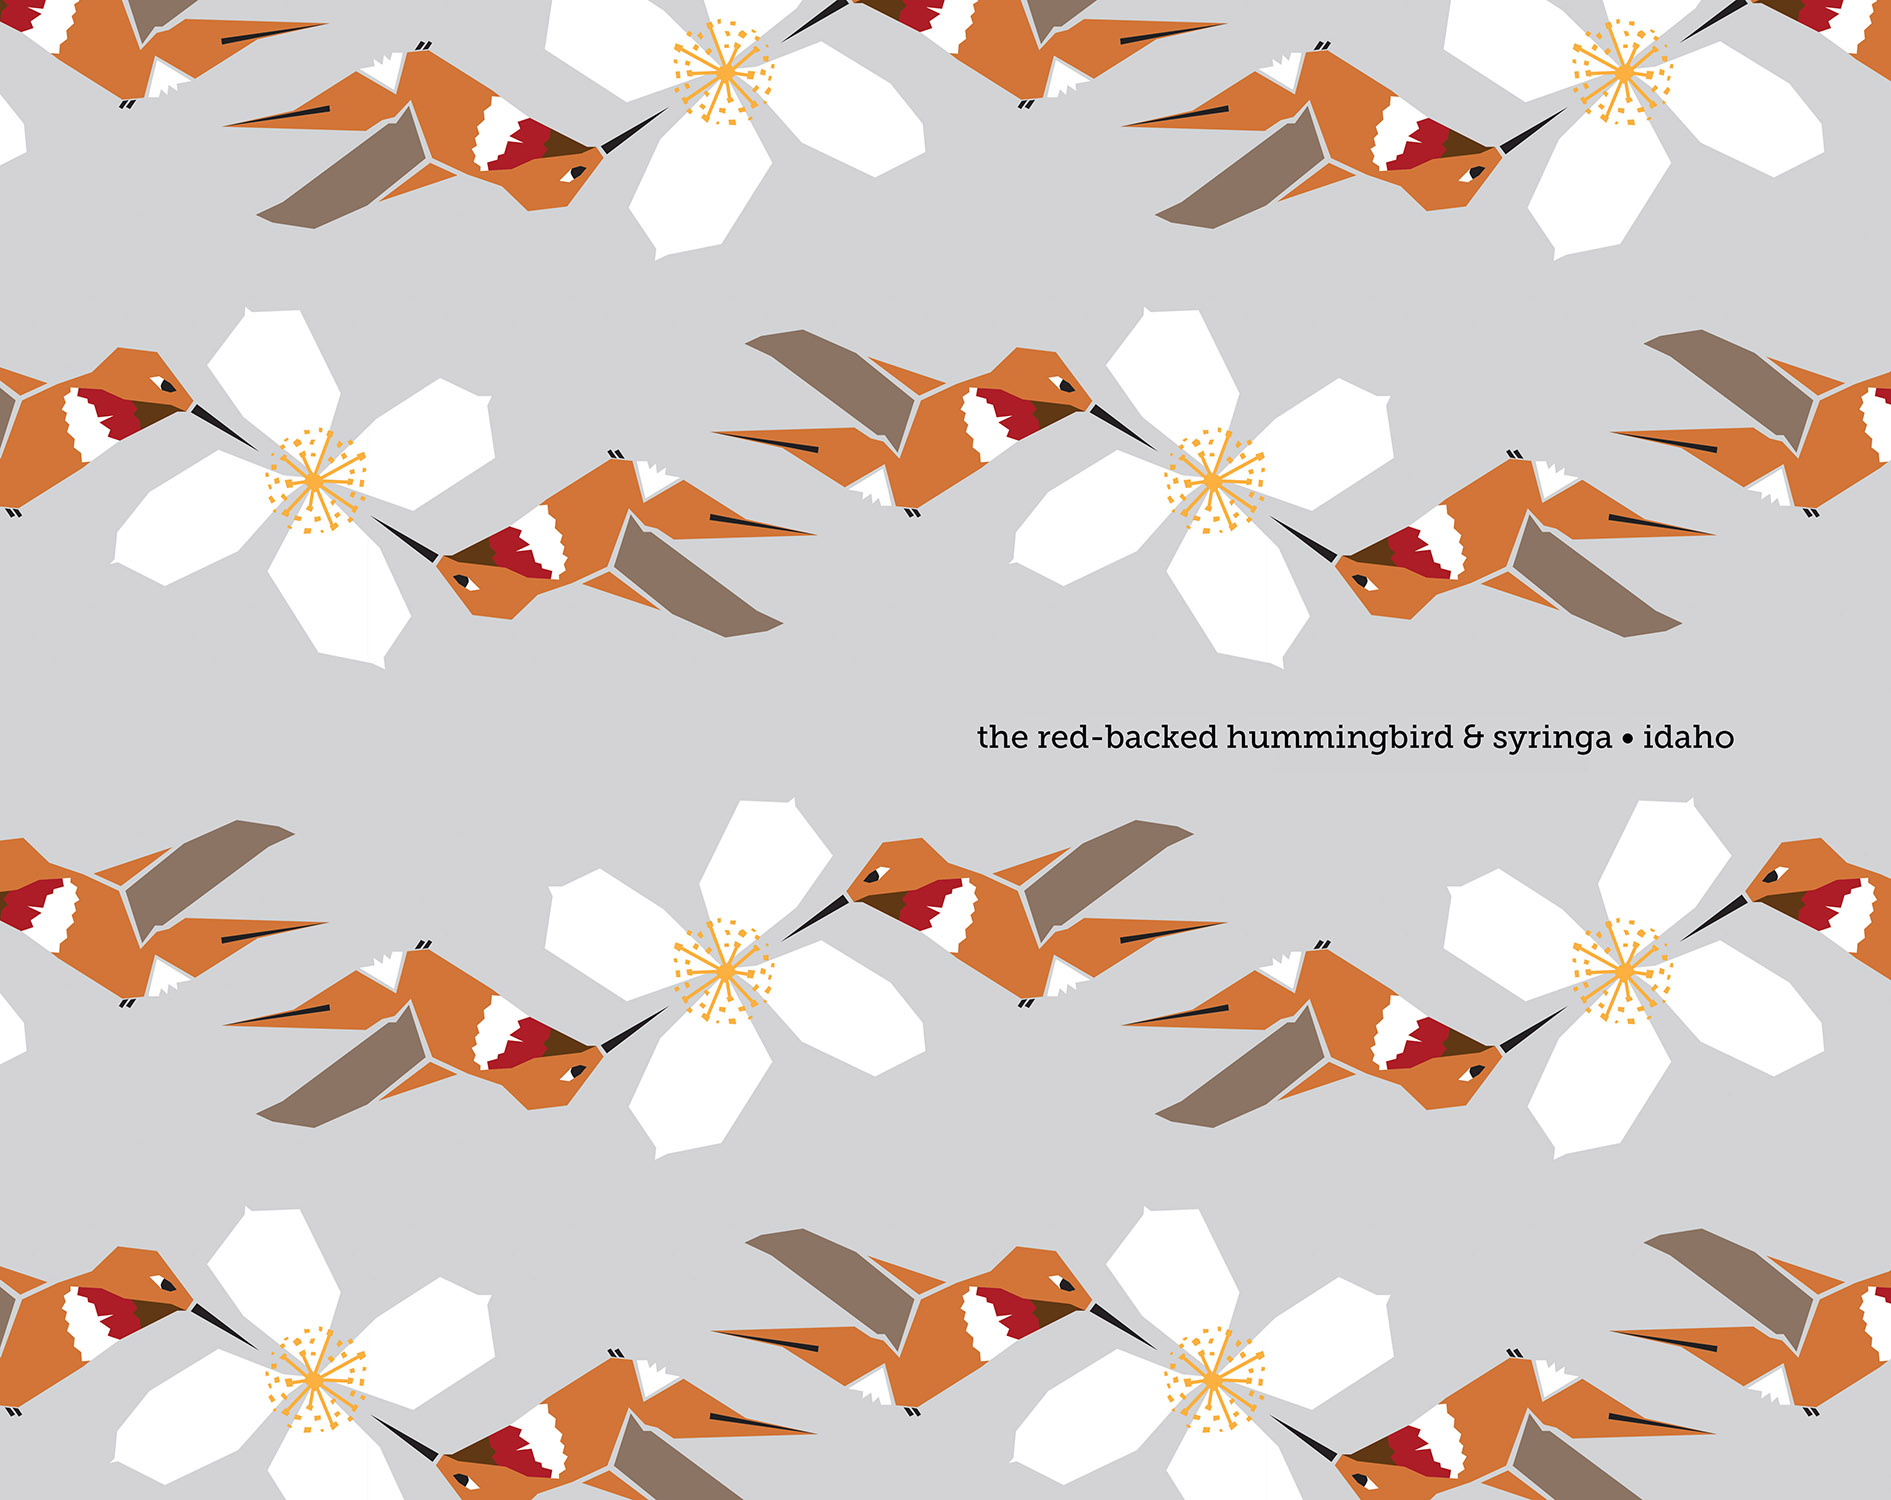 web_10x14Tray_Hummingbird-Syring_1500px.jpg